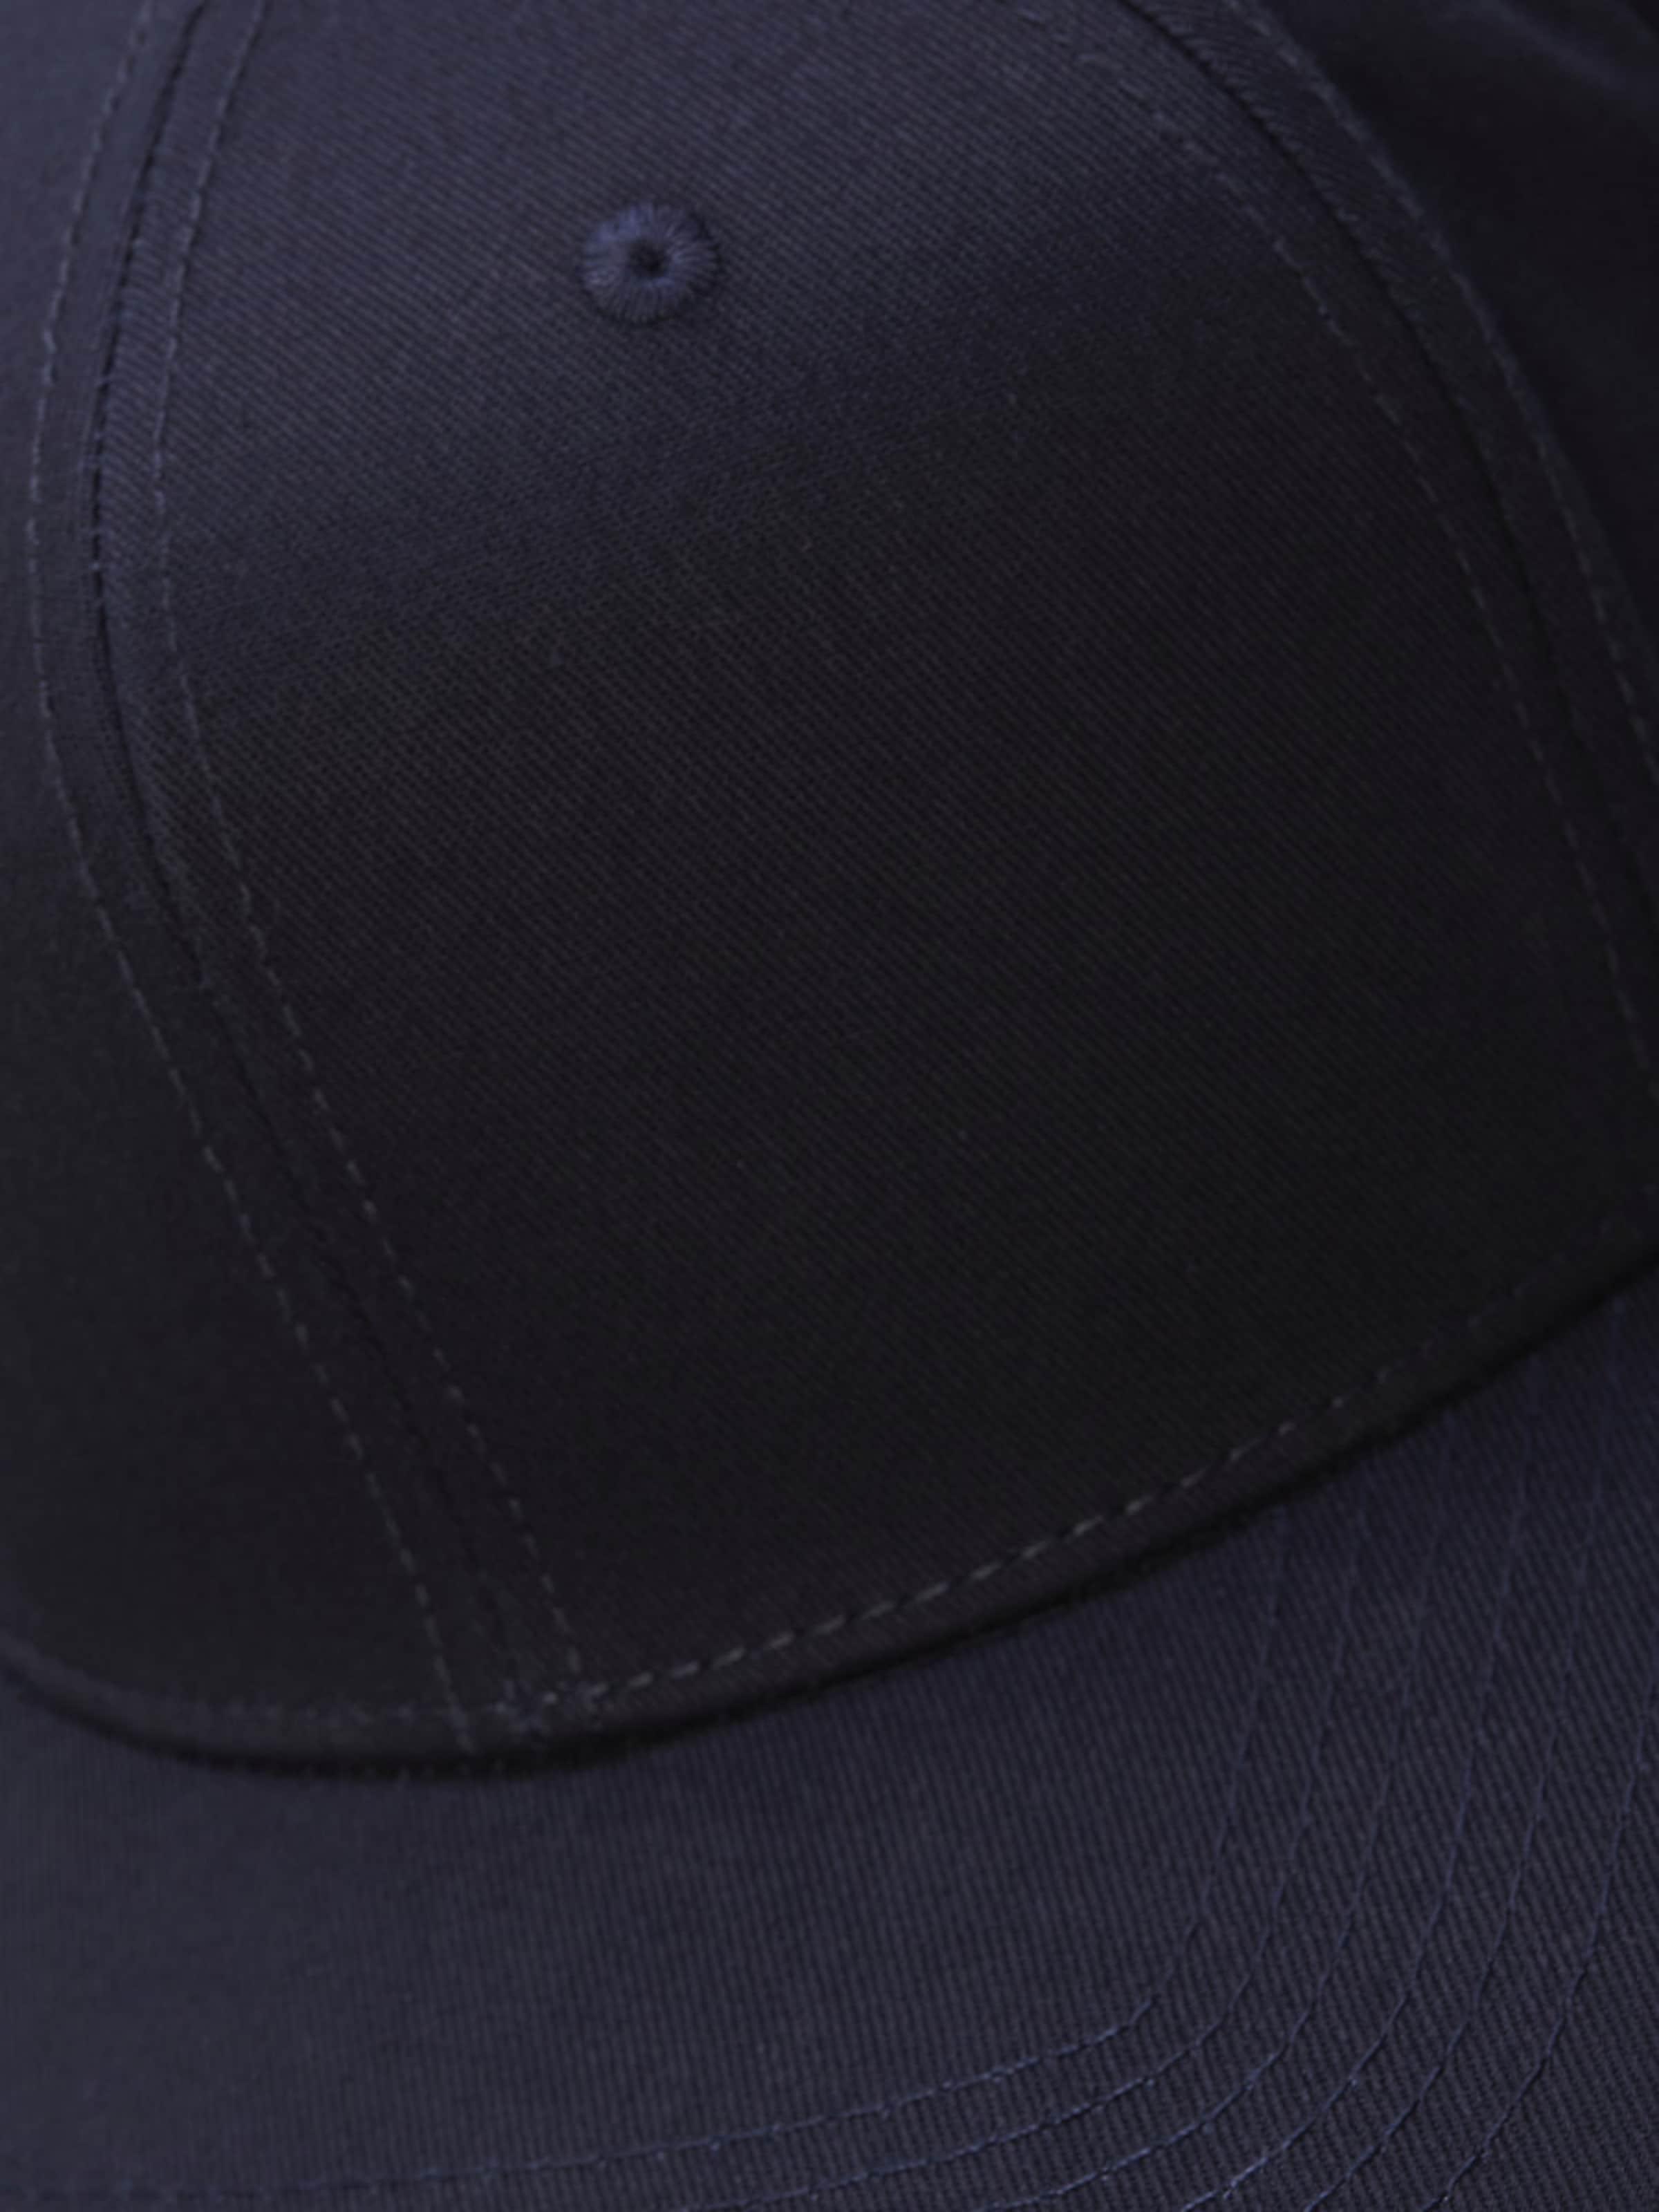 Billig Authentisch Auslass Rabatt Professionelle JACK & JONES Klassische Cap 2018 Zum Verkauf Verkauf Größten Lieferanten Ke3ERSFE